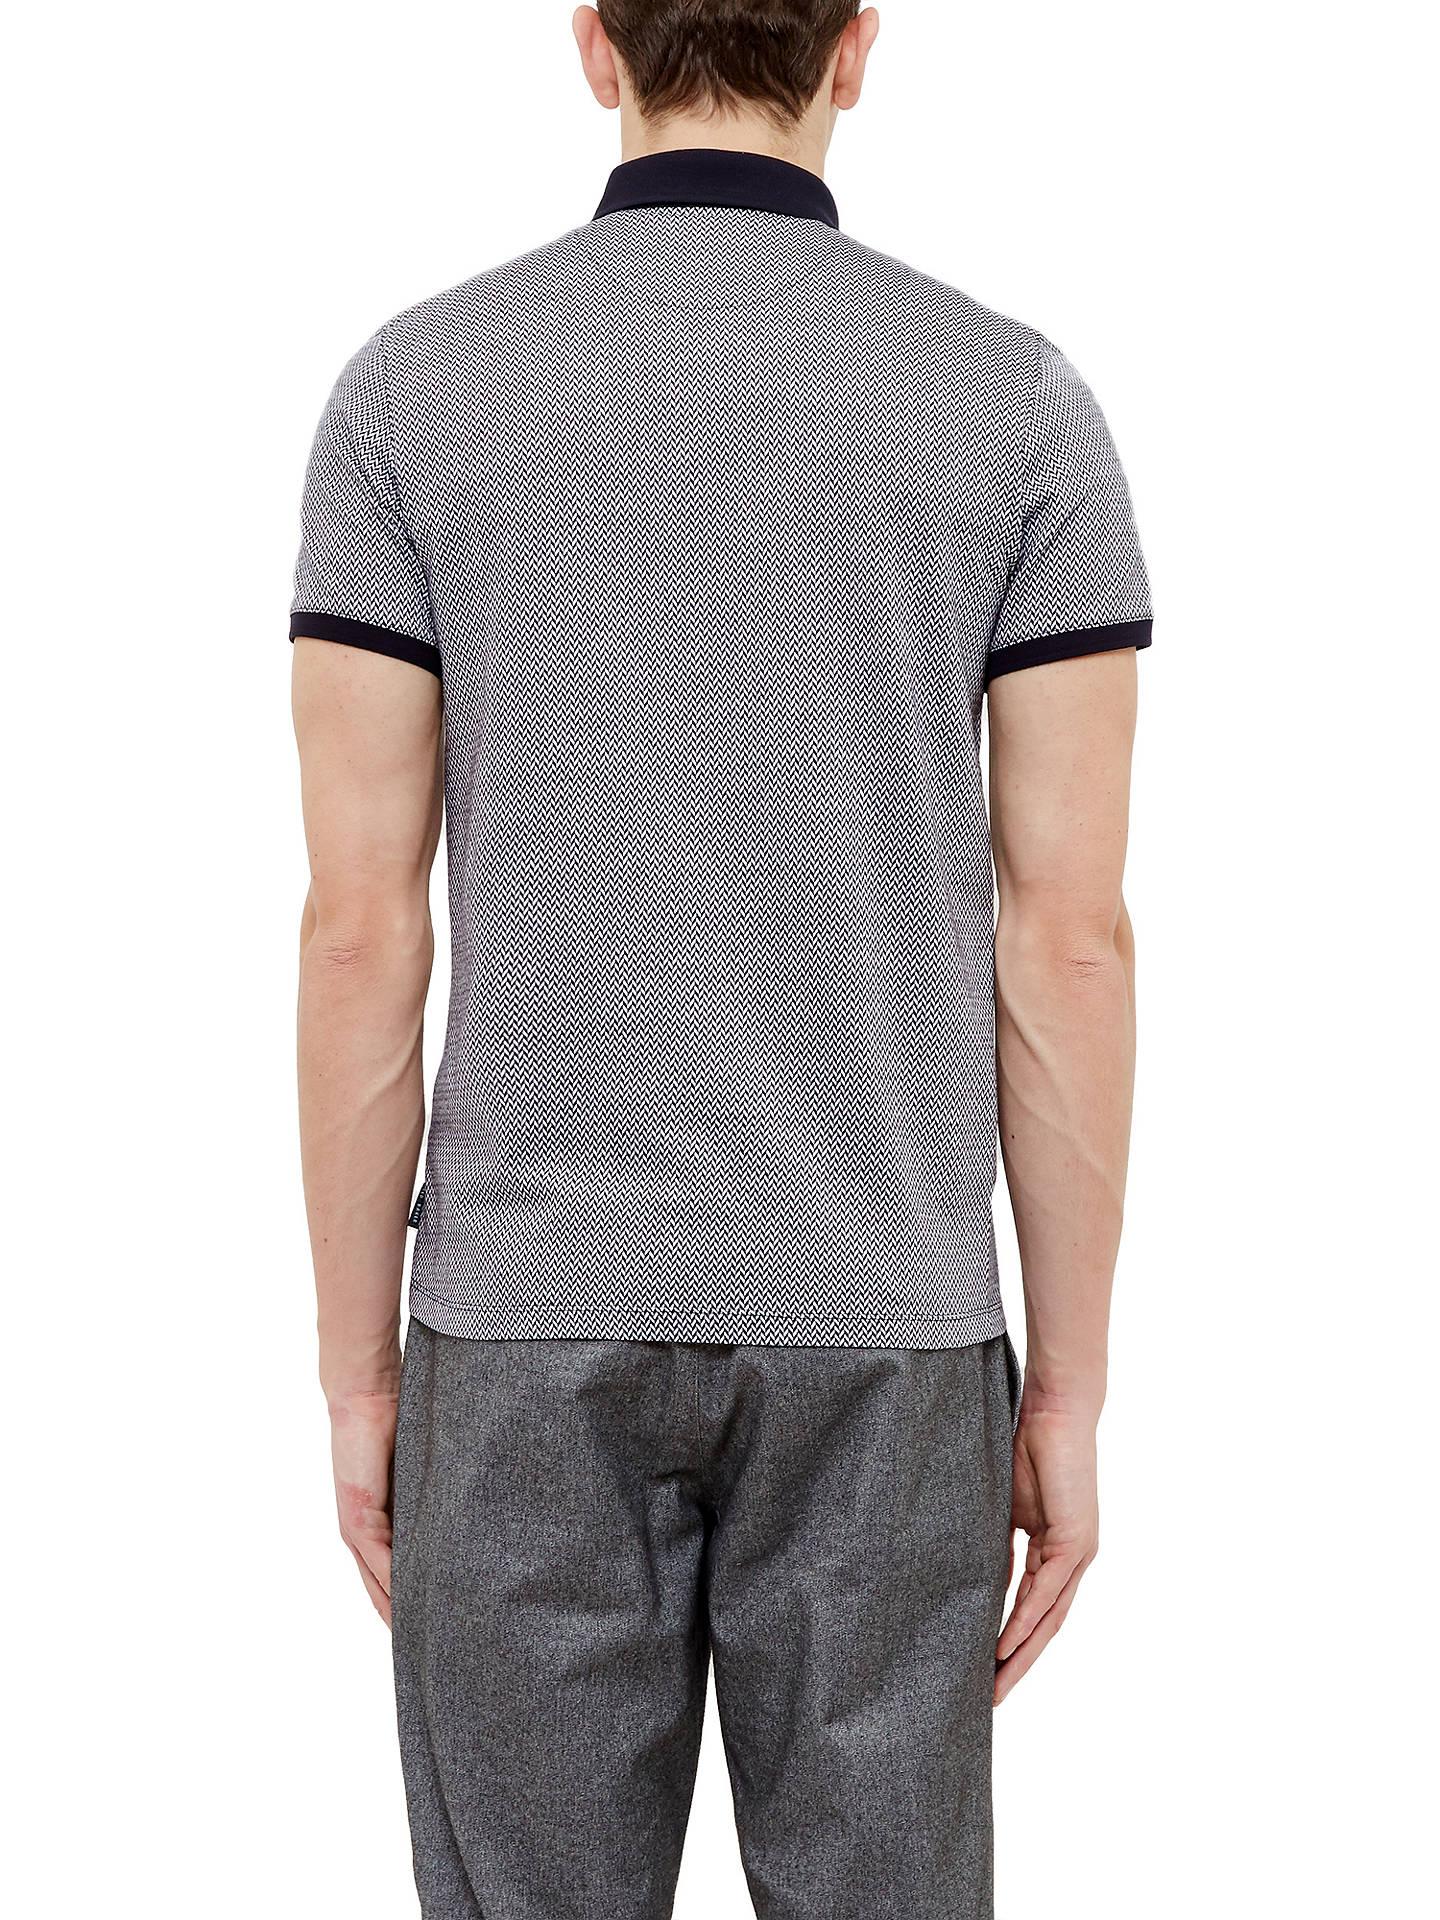 370cbc03e34337 Ted Baker Morrow Jacquard Polo Shirt at John Lewis   Partners